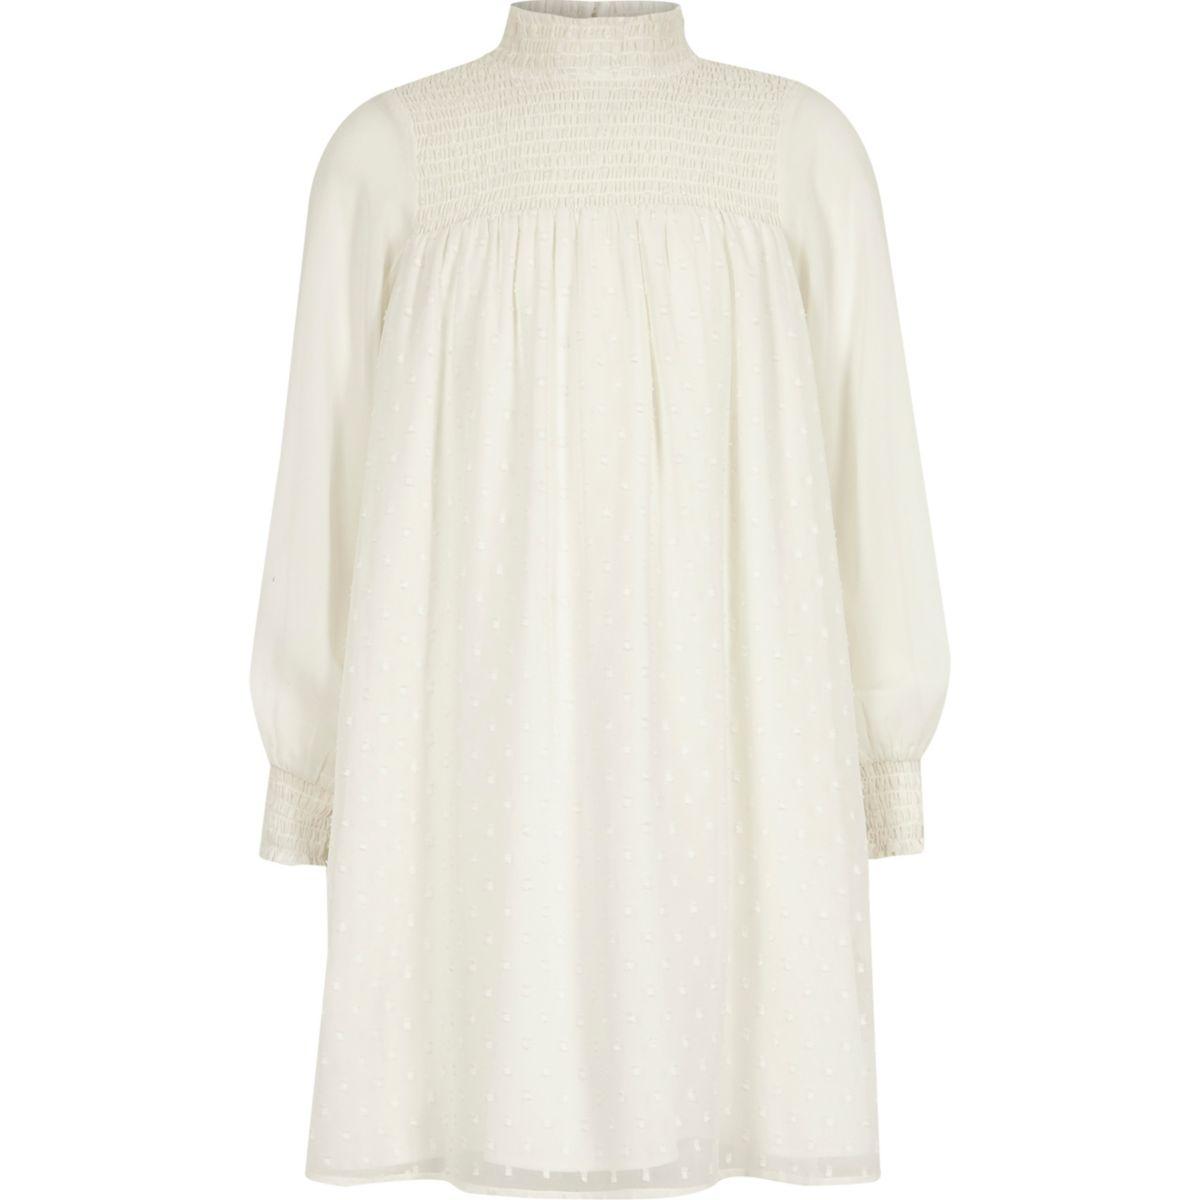 Girls white shirred high neck trapeze dress